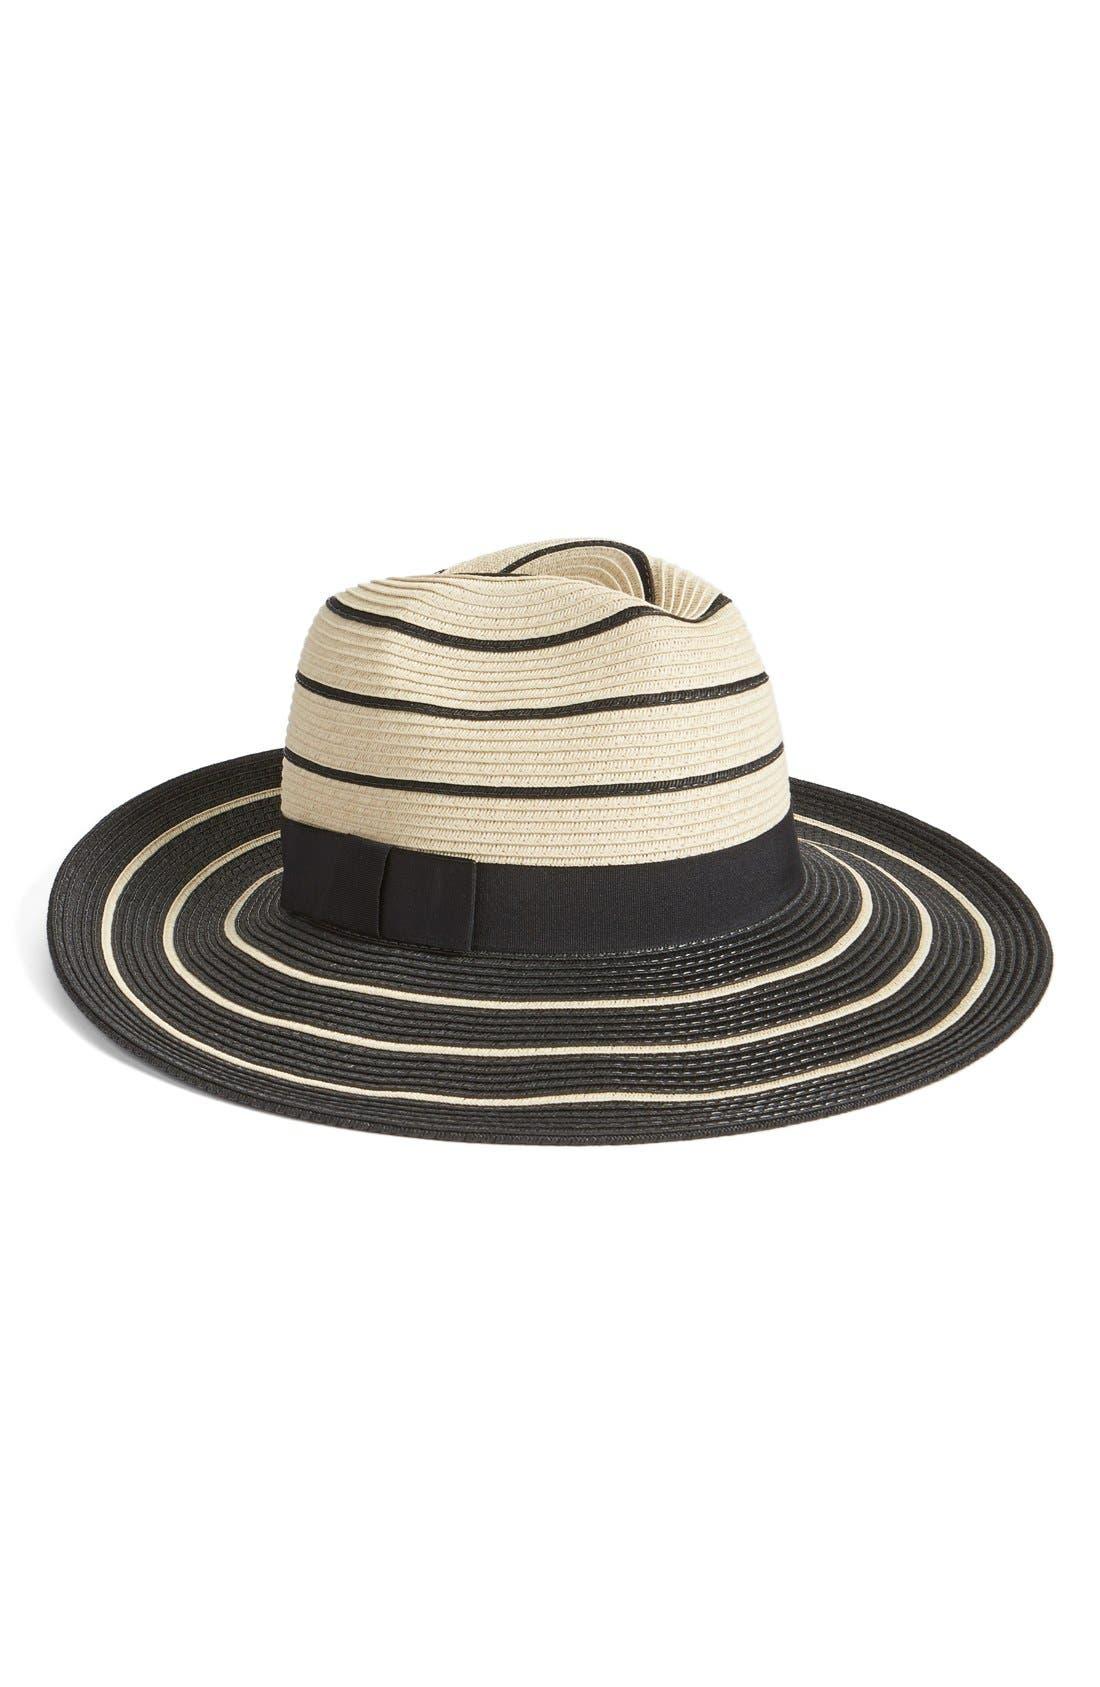 Alternate Image 1 Selected - Halogen Striped Panama Hat